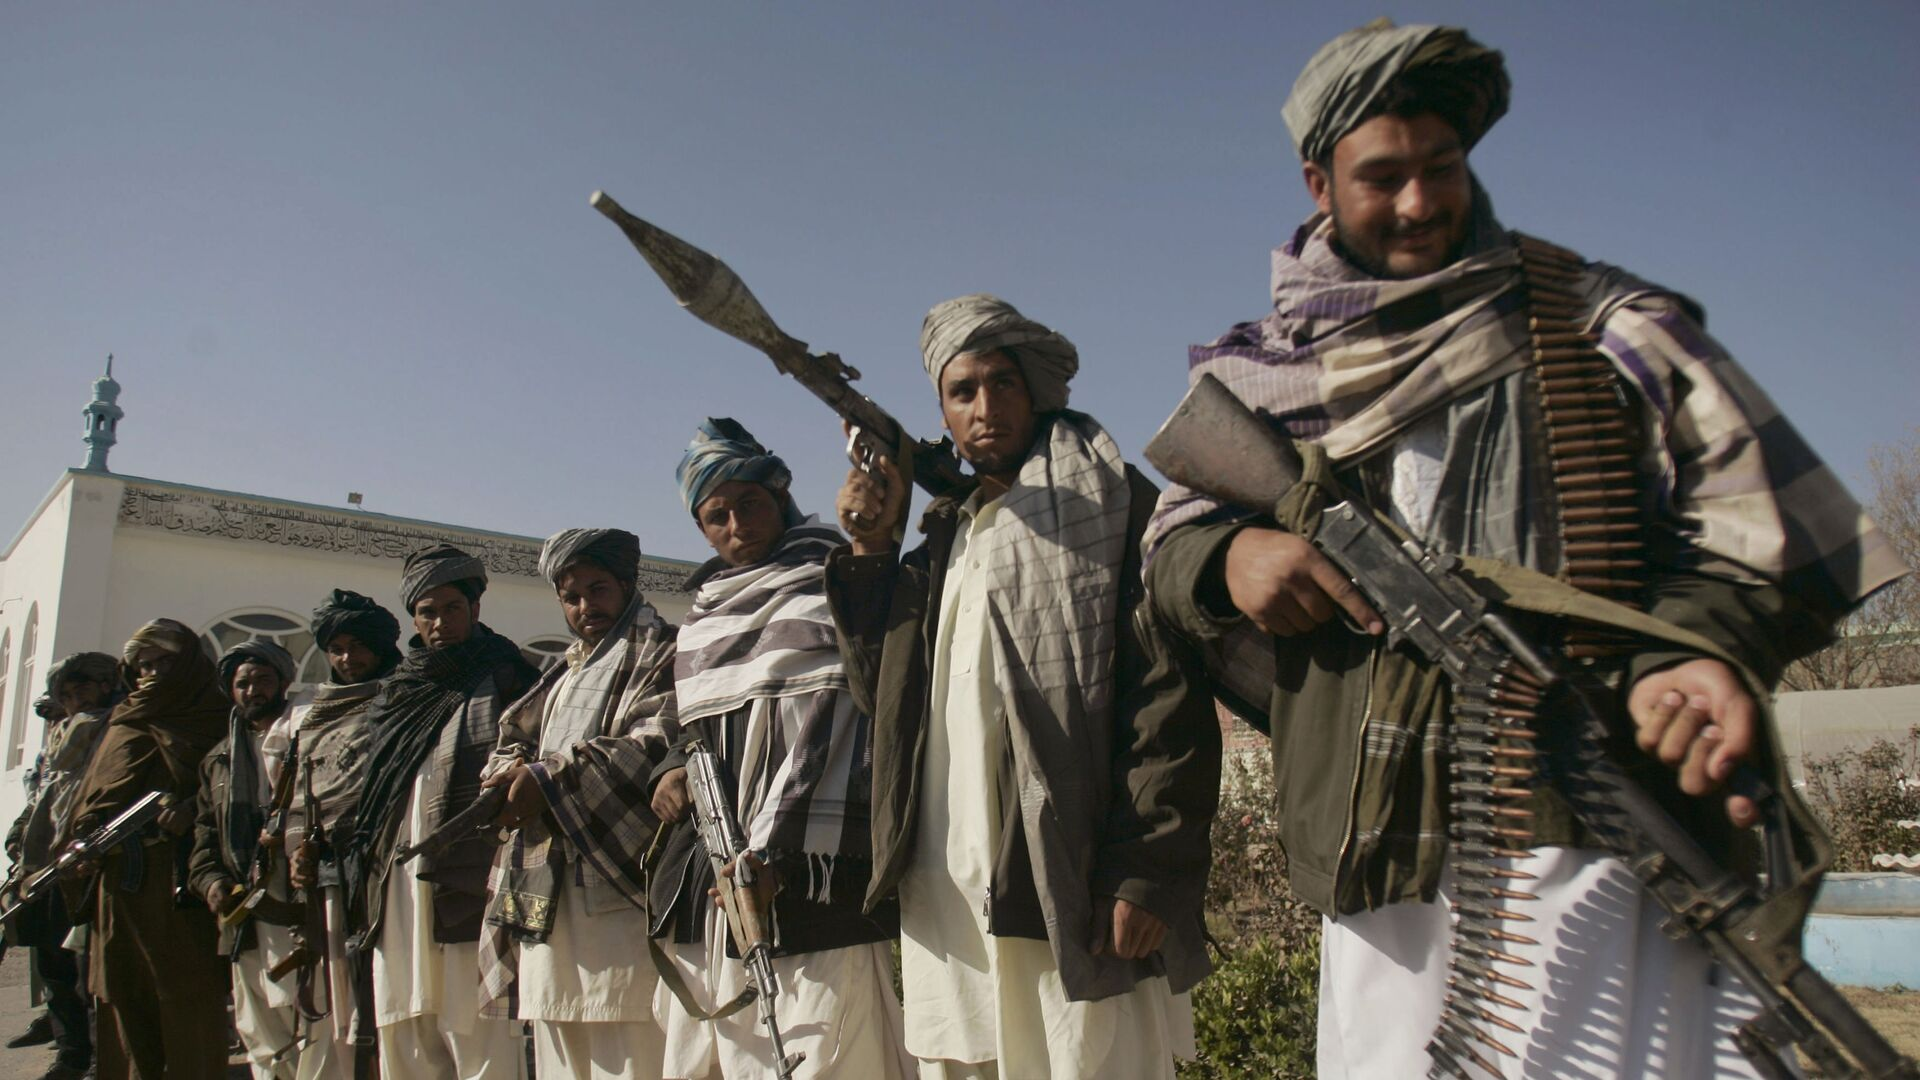 Ex militanti del movimento radicale Talebani a Herat - Sputnik Italia, 1920, 04.08.2021